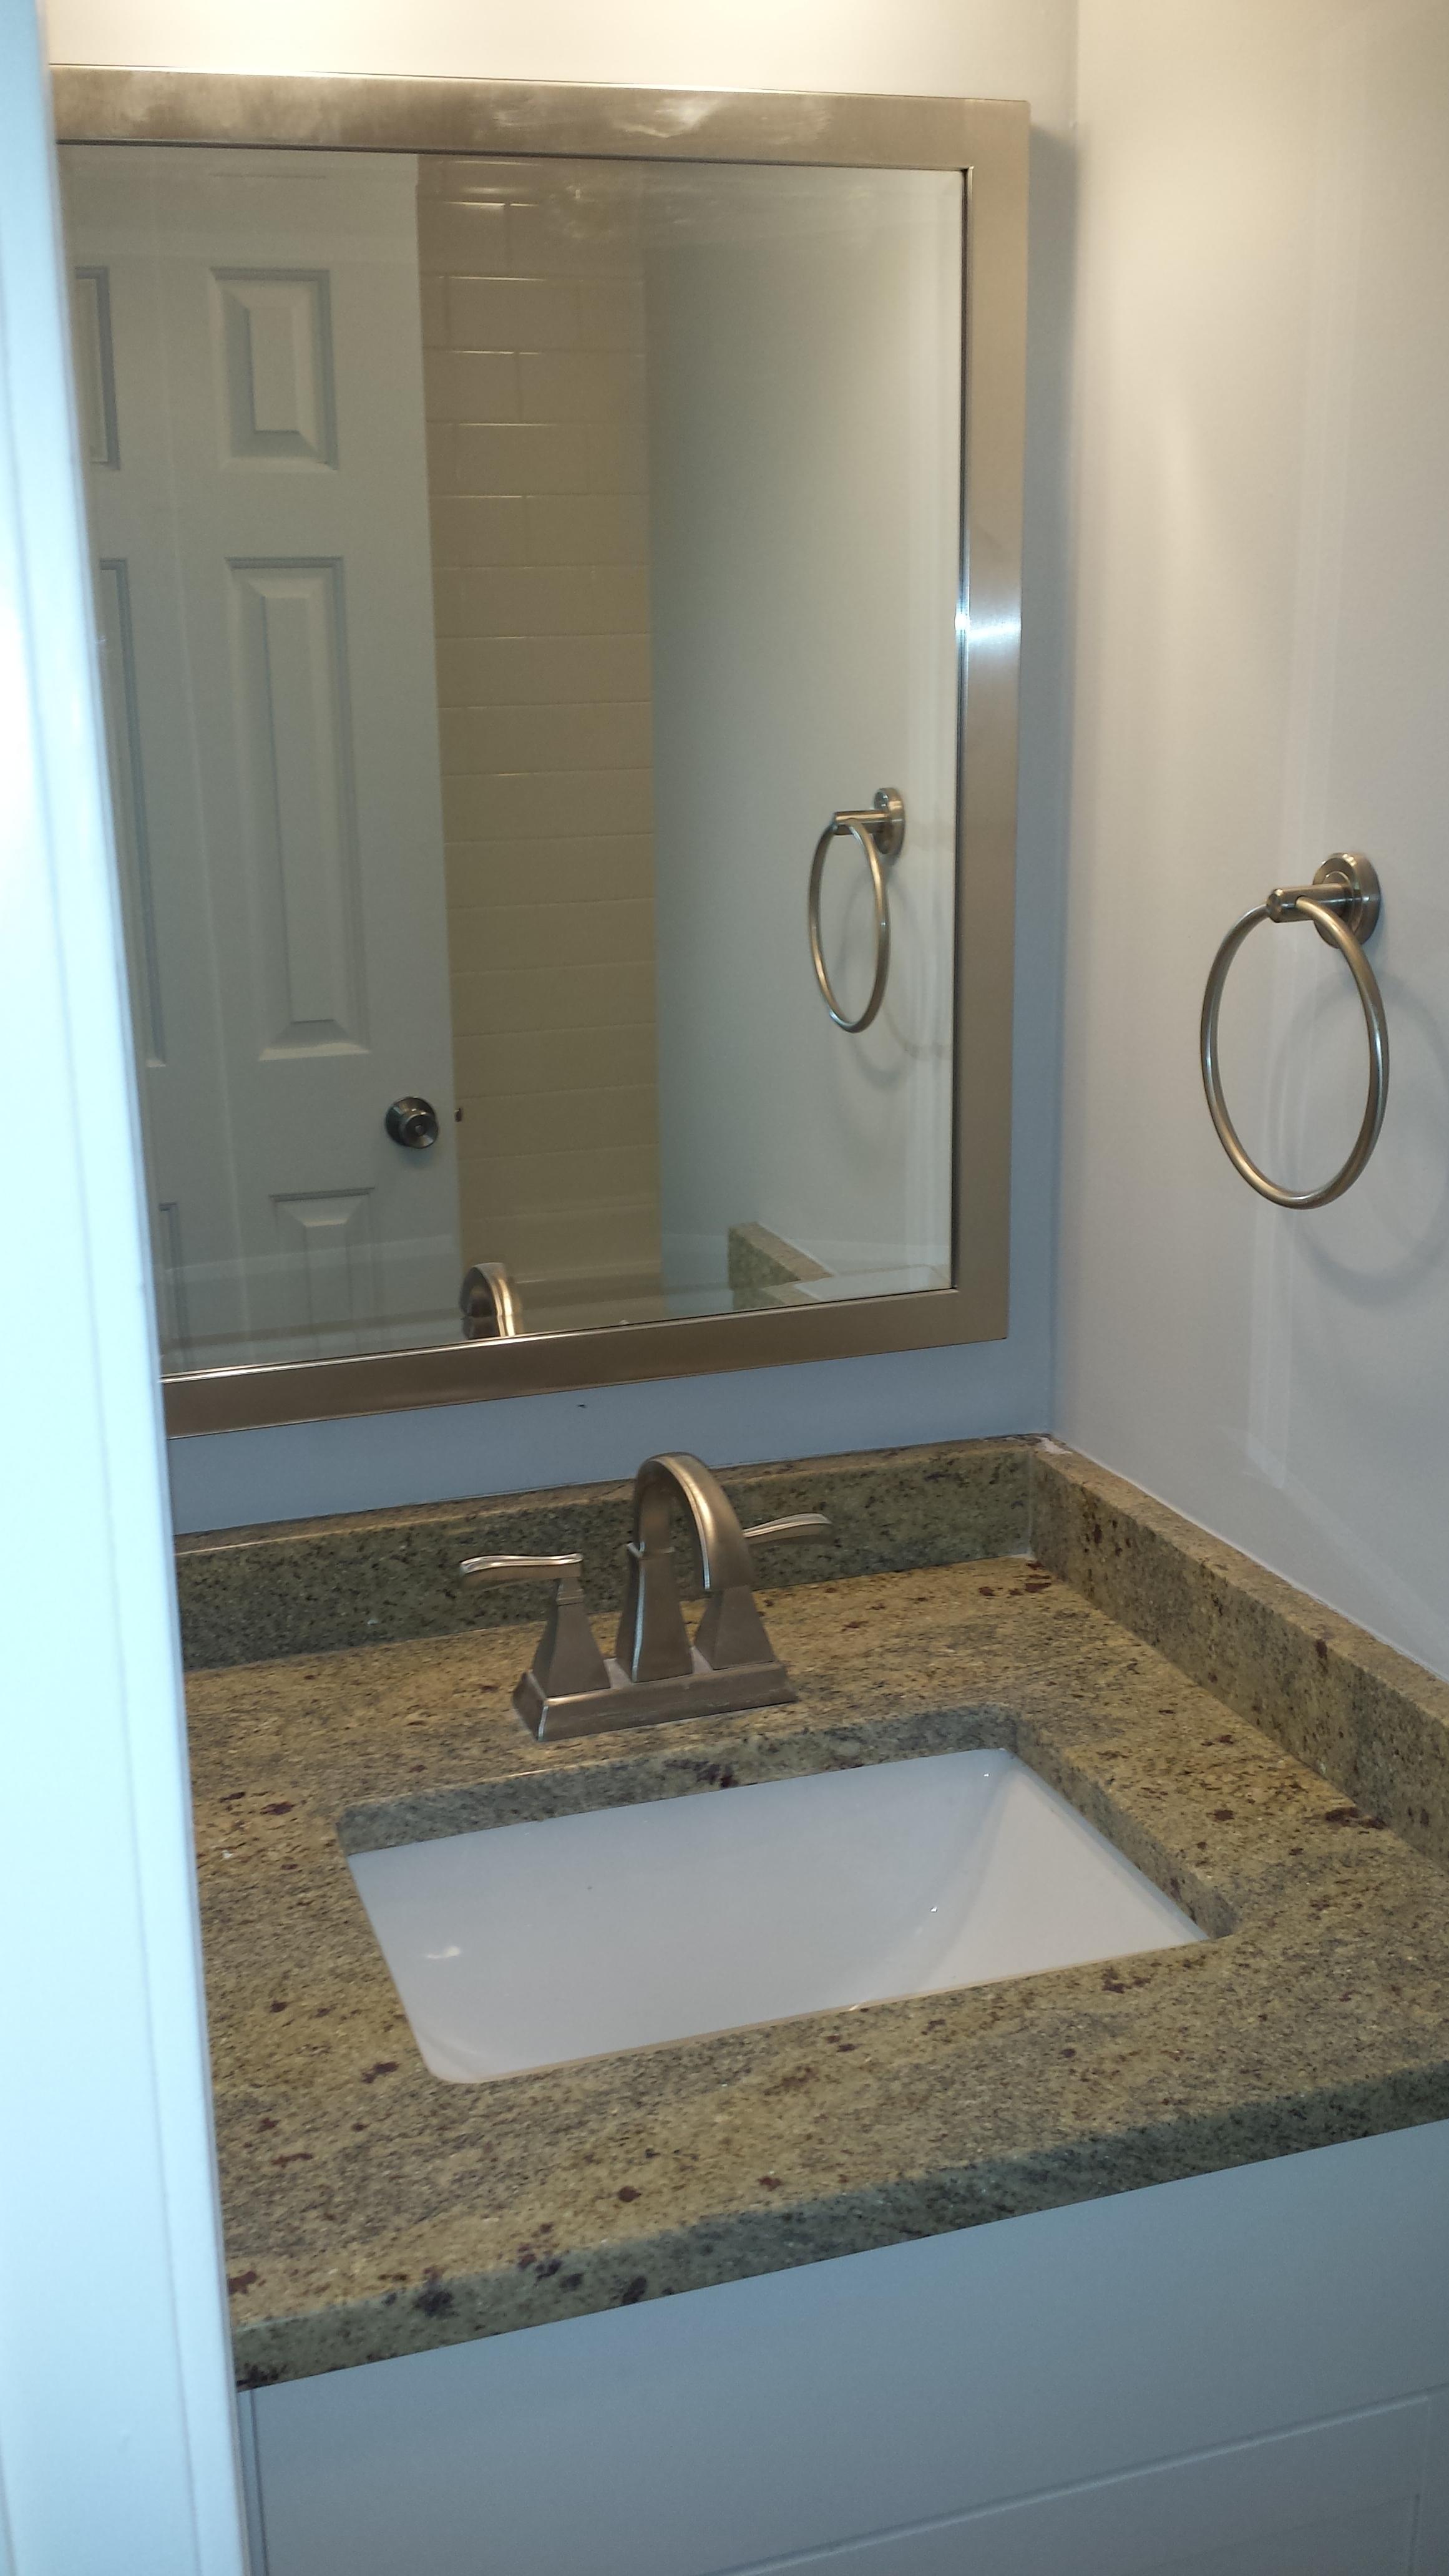 Greensboro Street, N., 504-C - Bathroom.jpg